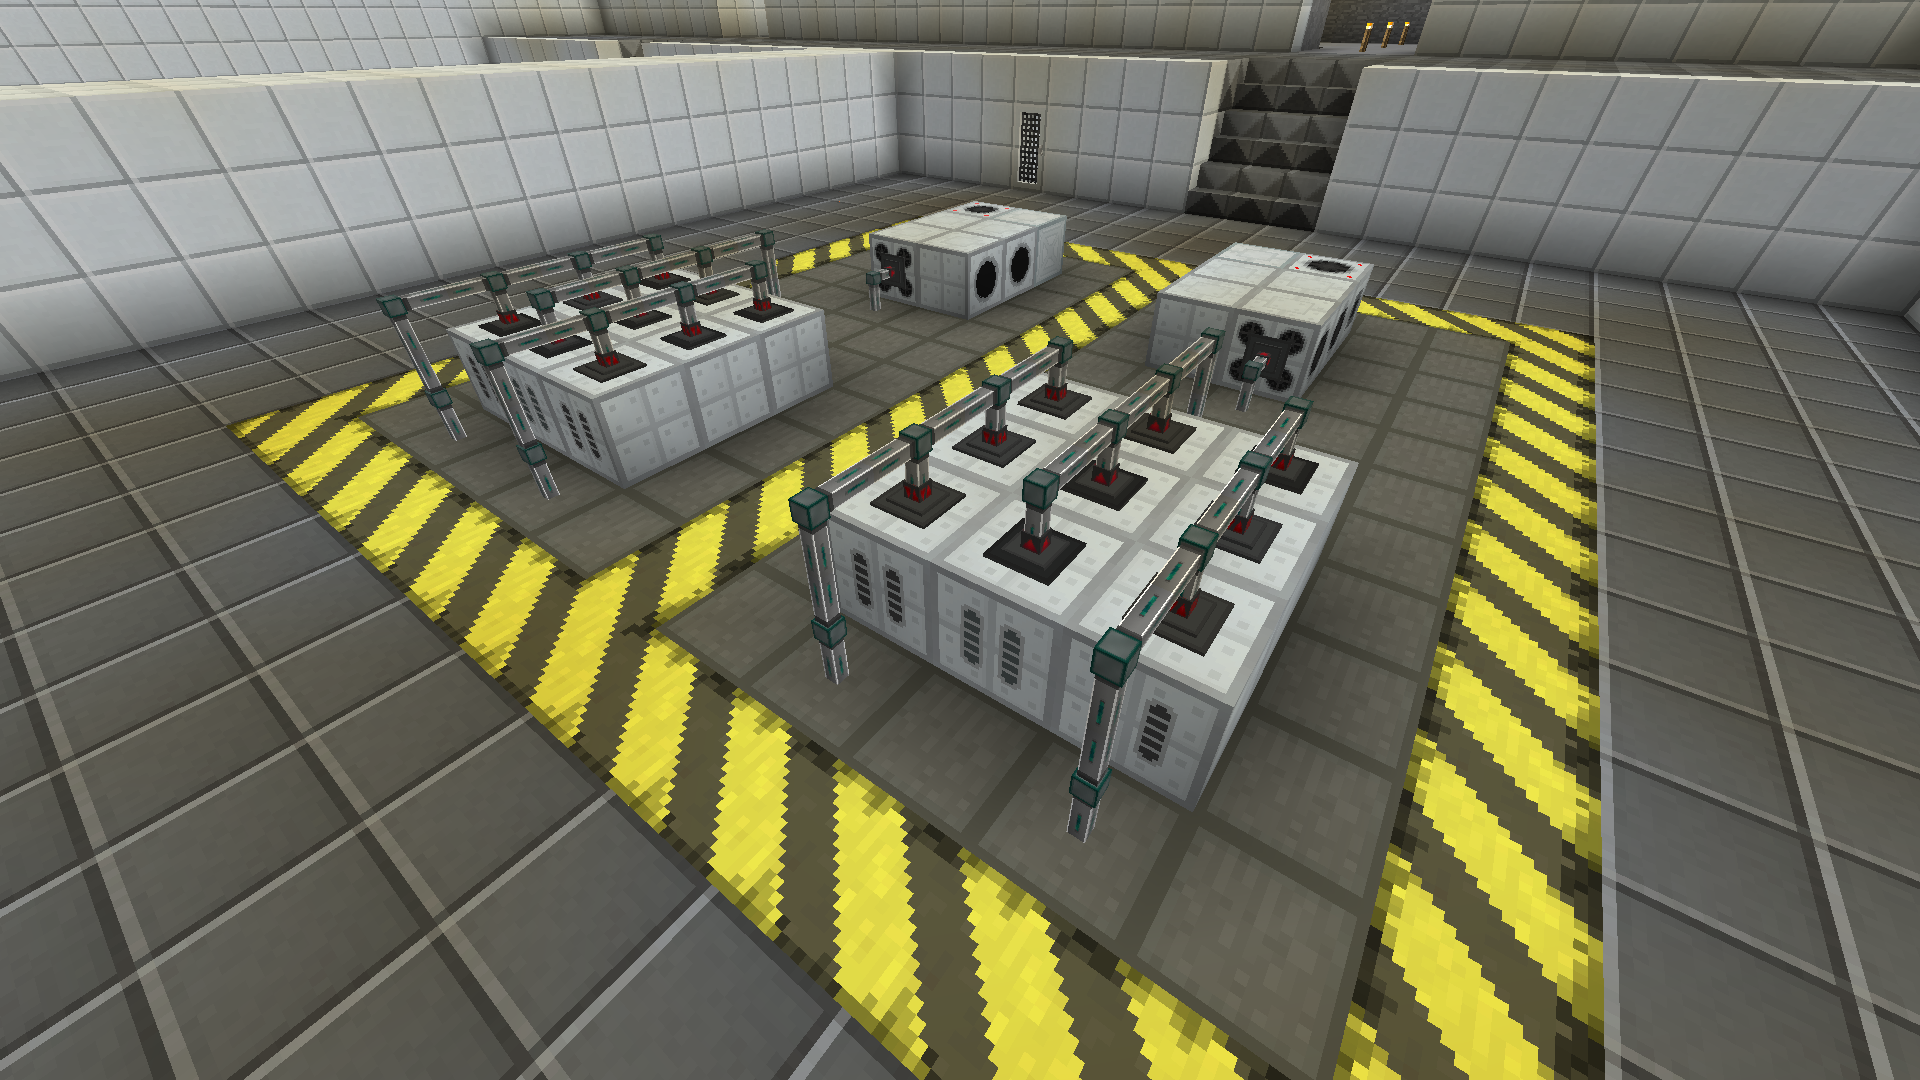 My Fluid Reactor Experience fun but sadface Nuclear